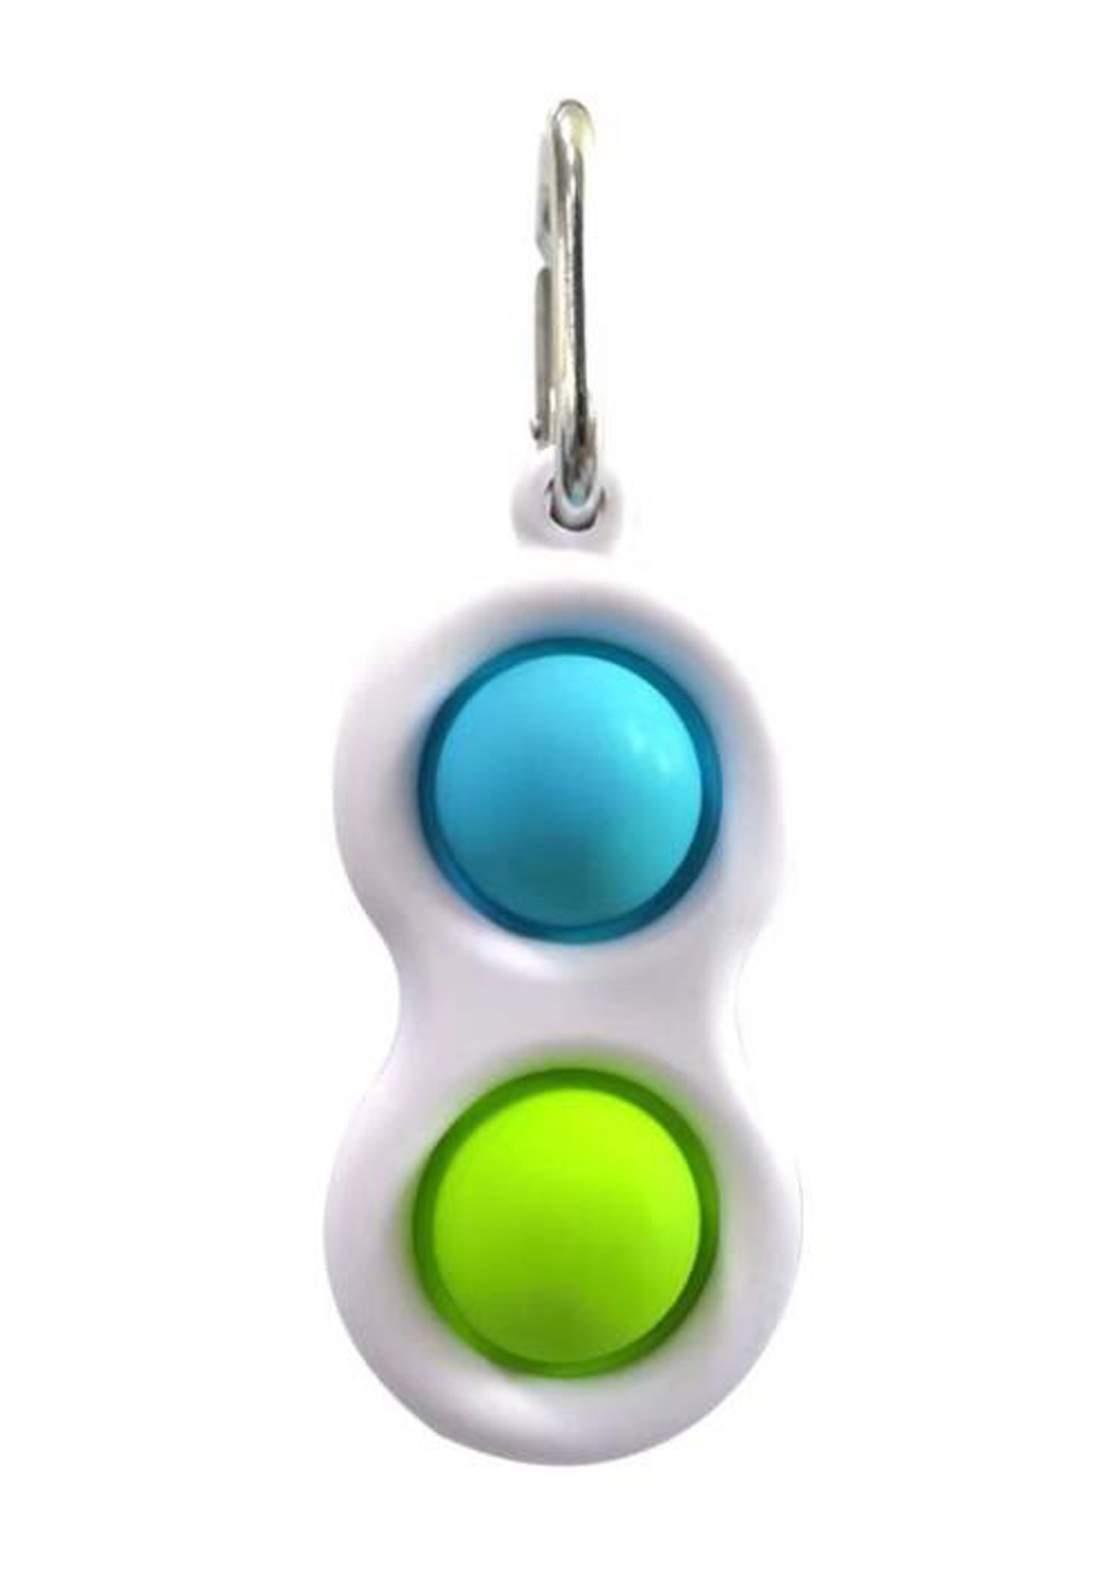 Fidget  Toy Hand Portable   ميدالية مفاتيح مع حلقات سيلكونية